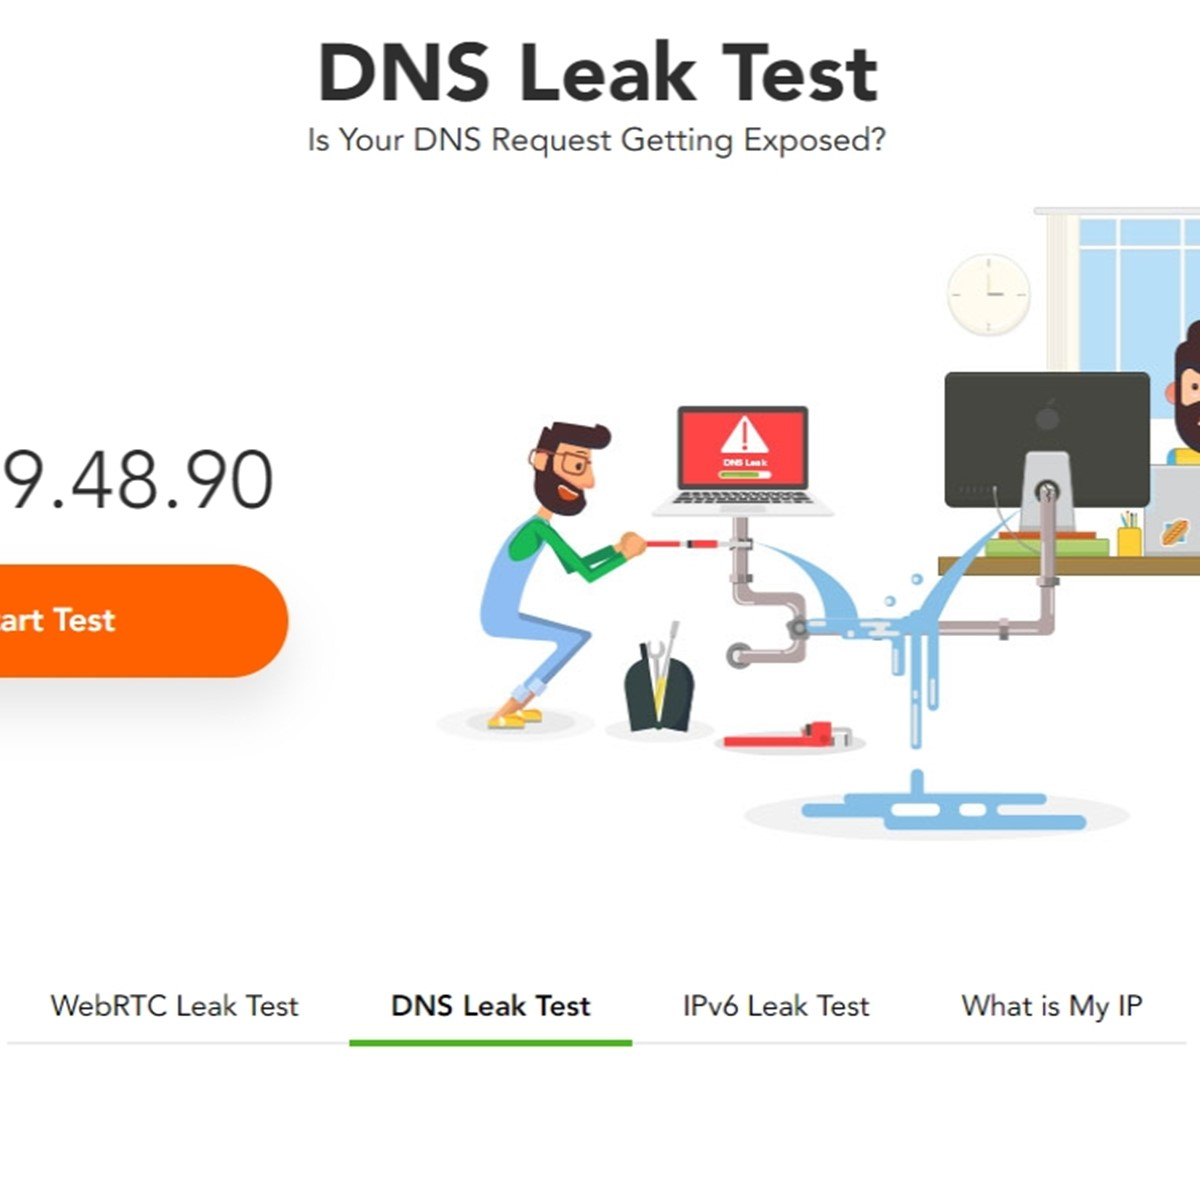 PureVPN - WebRTC Leak Test Alternatives and Similar Websites and